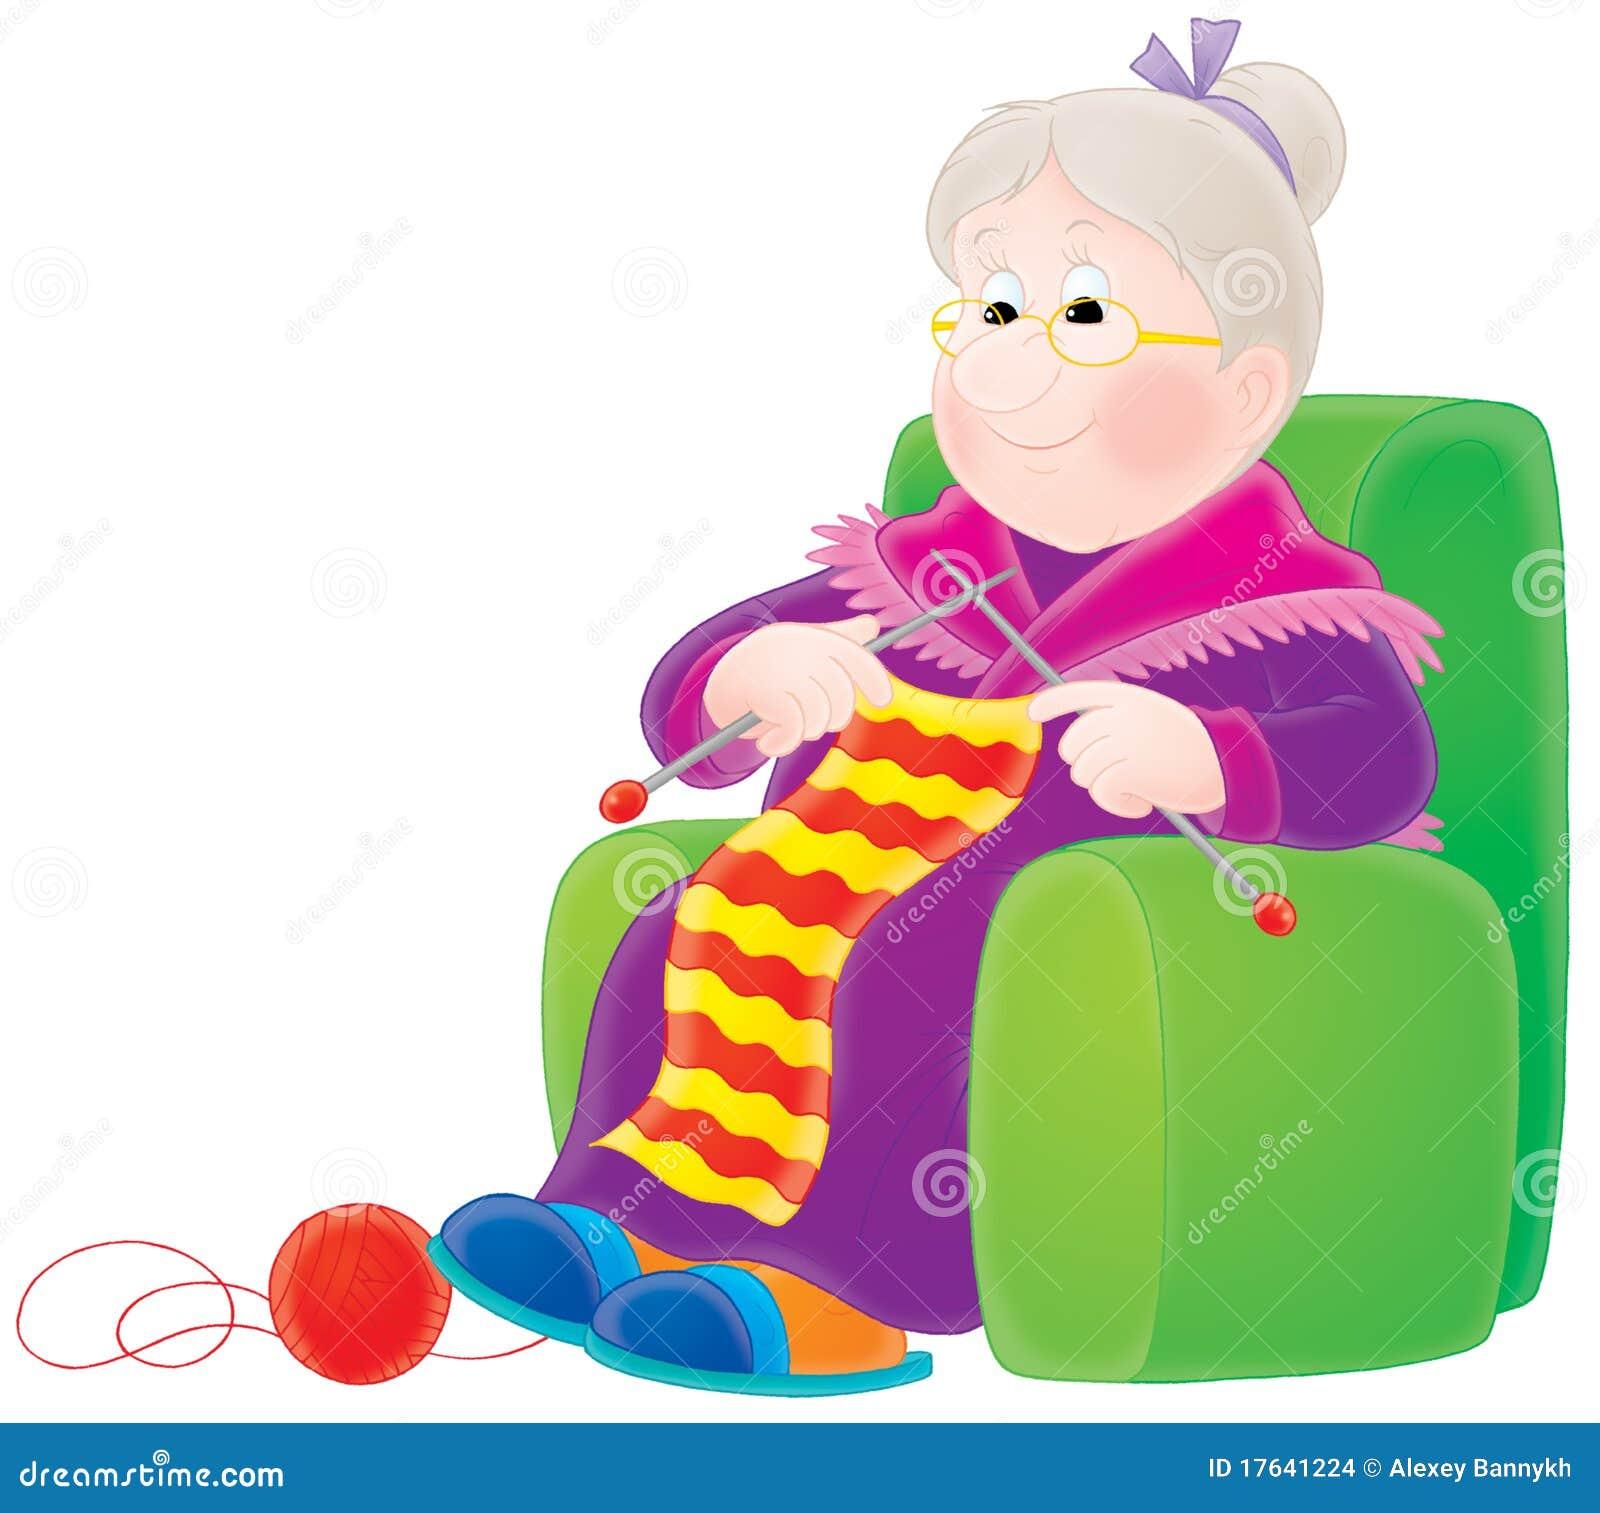 Grandma Knitting Cartoon : Grandmother knits a scarf stock illustration